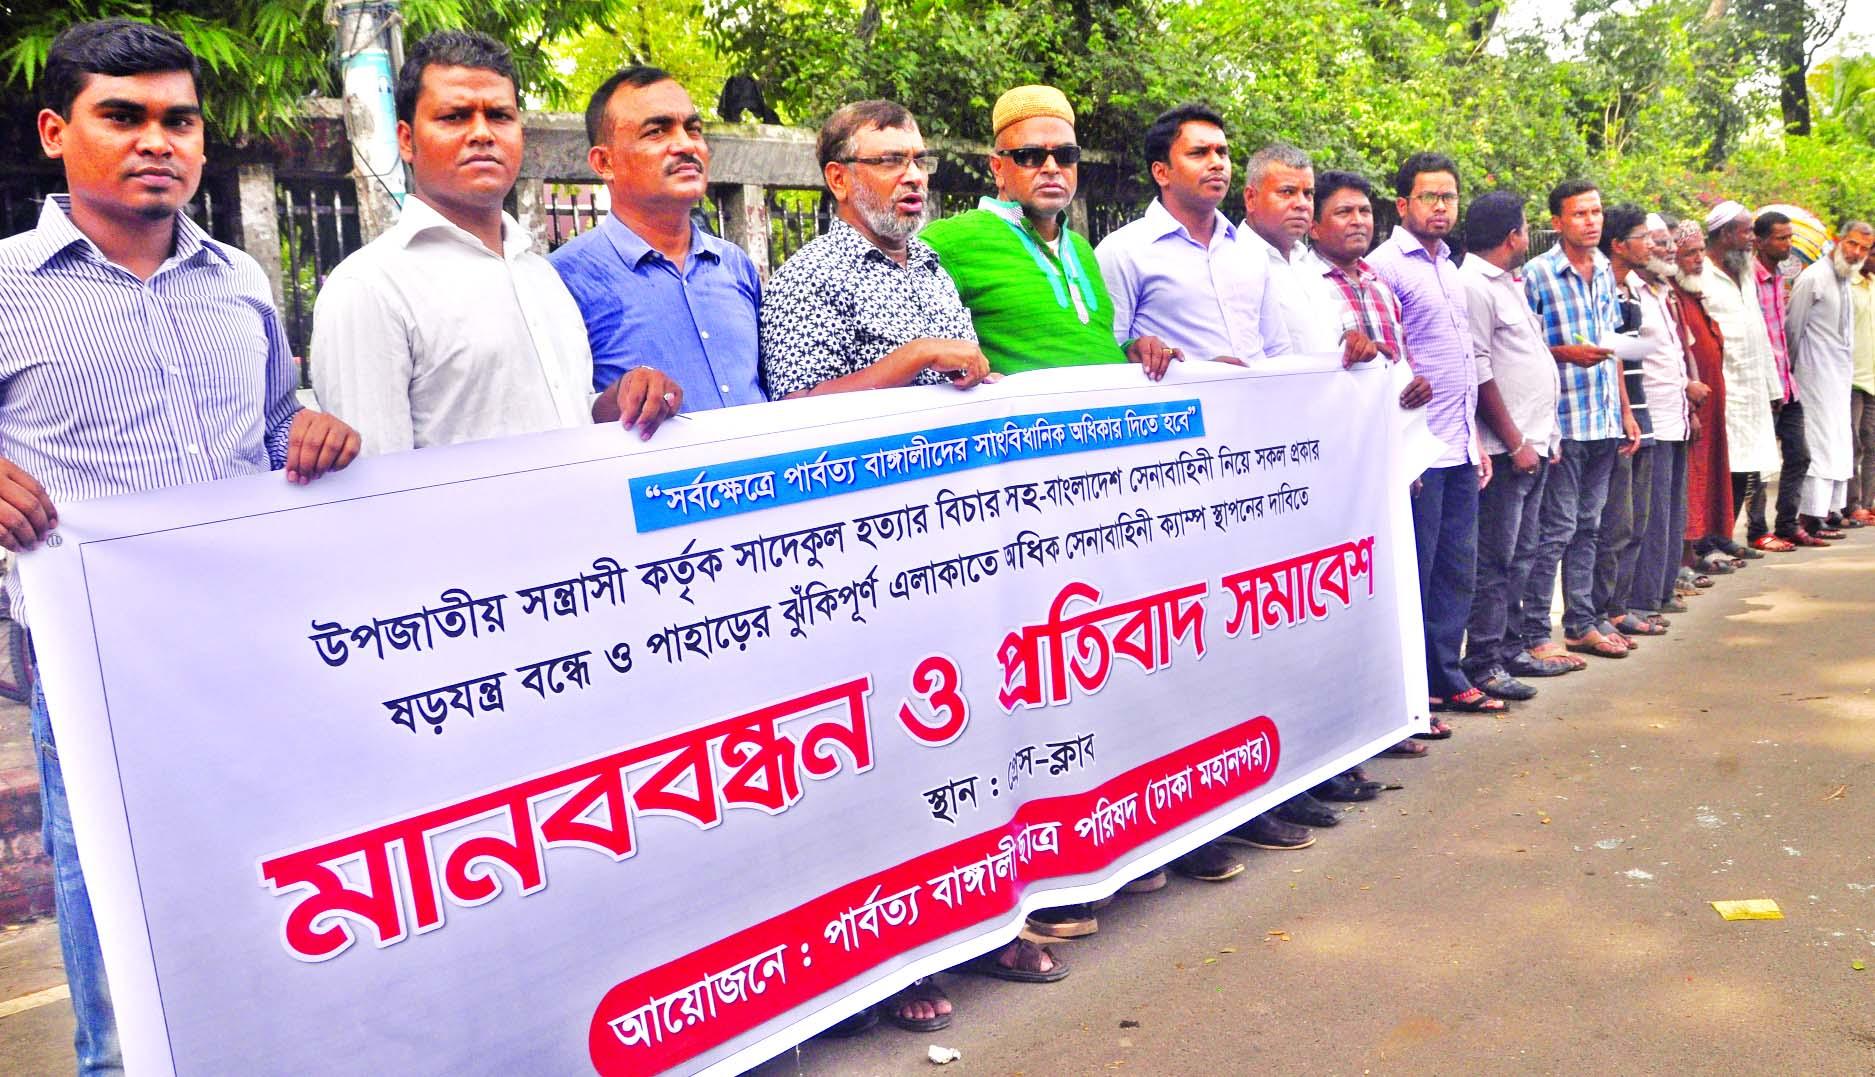 Parbatya Bangalee Chhatra Parishad (Dhaka Mahanagari) formed a human chain in front of the Jatiya Press Club on Tuesday demanding trial of killer(s) of Sadequl.